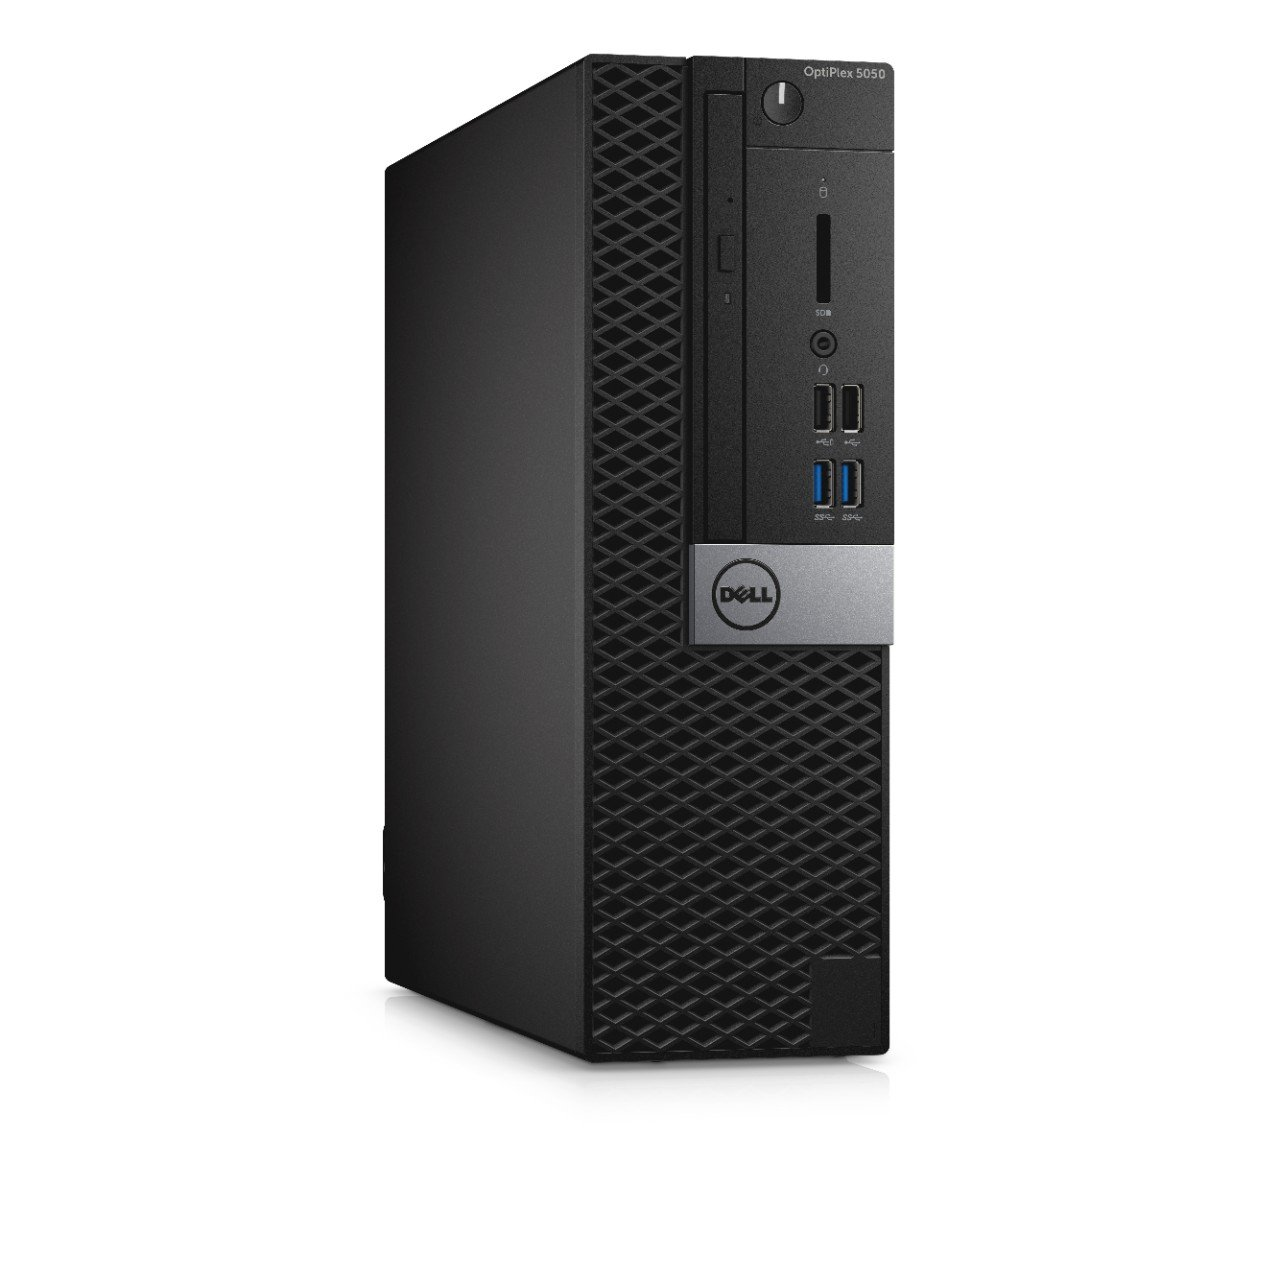 Dell H60K4 OptiPlex 5050 Small Form Factor Desktop, Intel Core i5-7500, 8GB RAM, 500GB HDD, Black